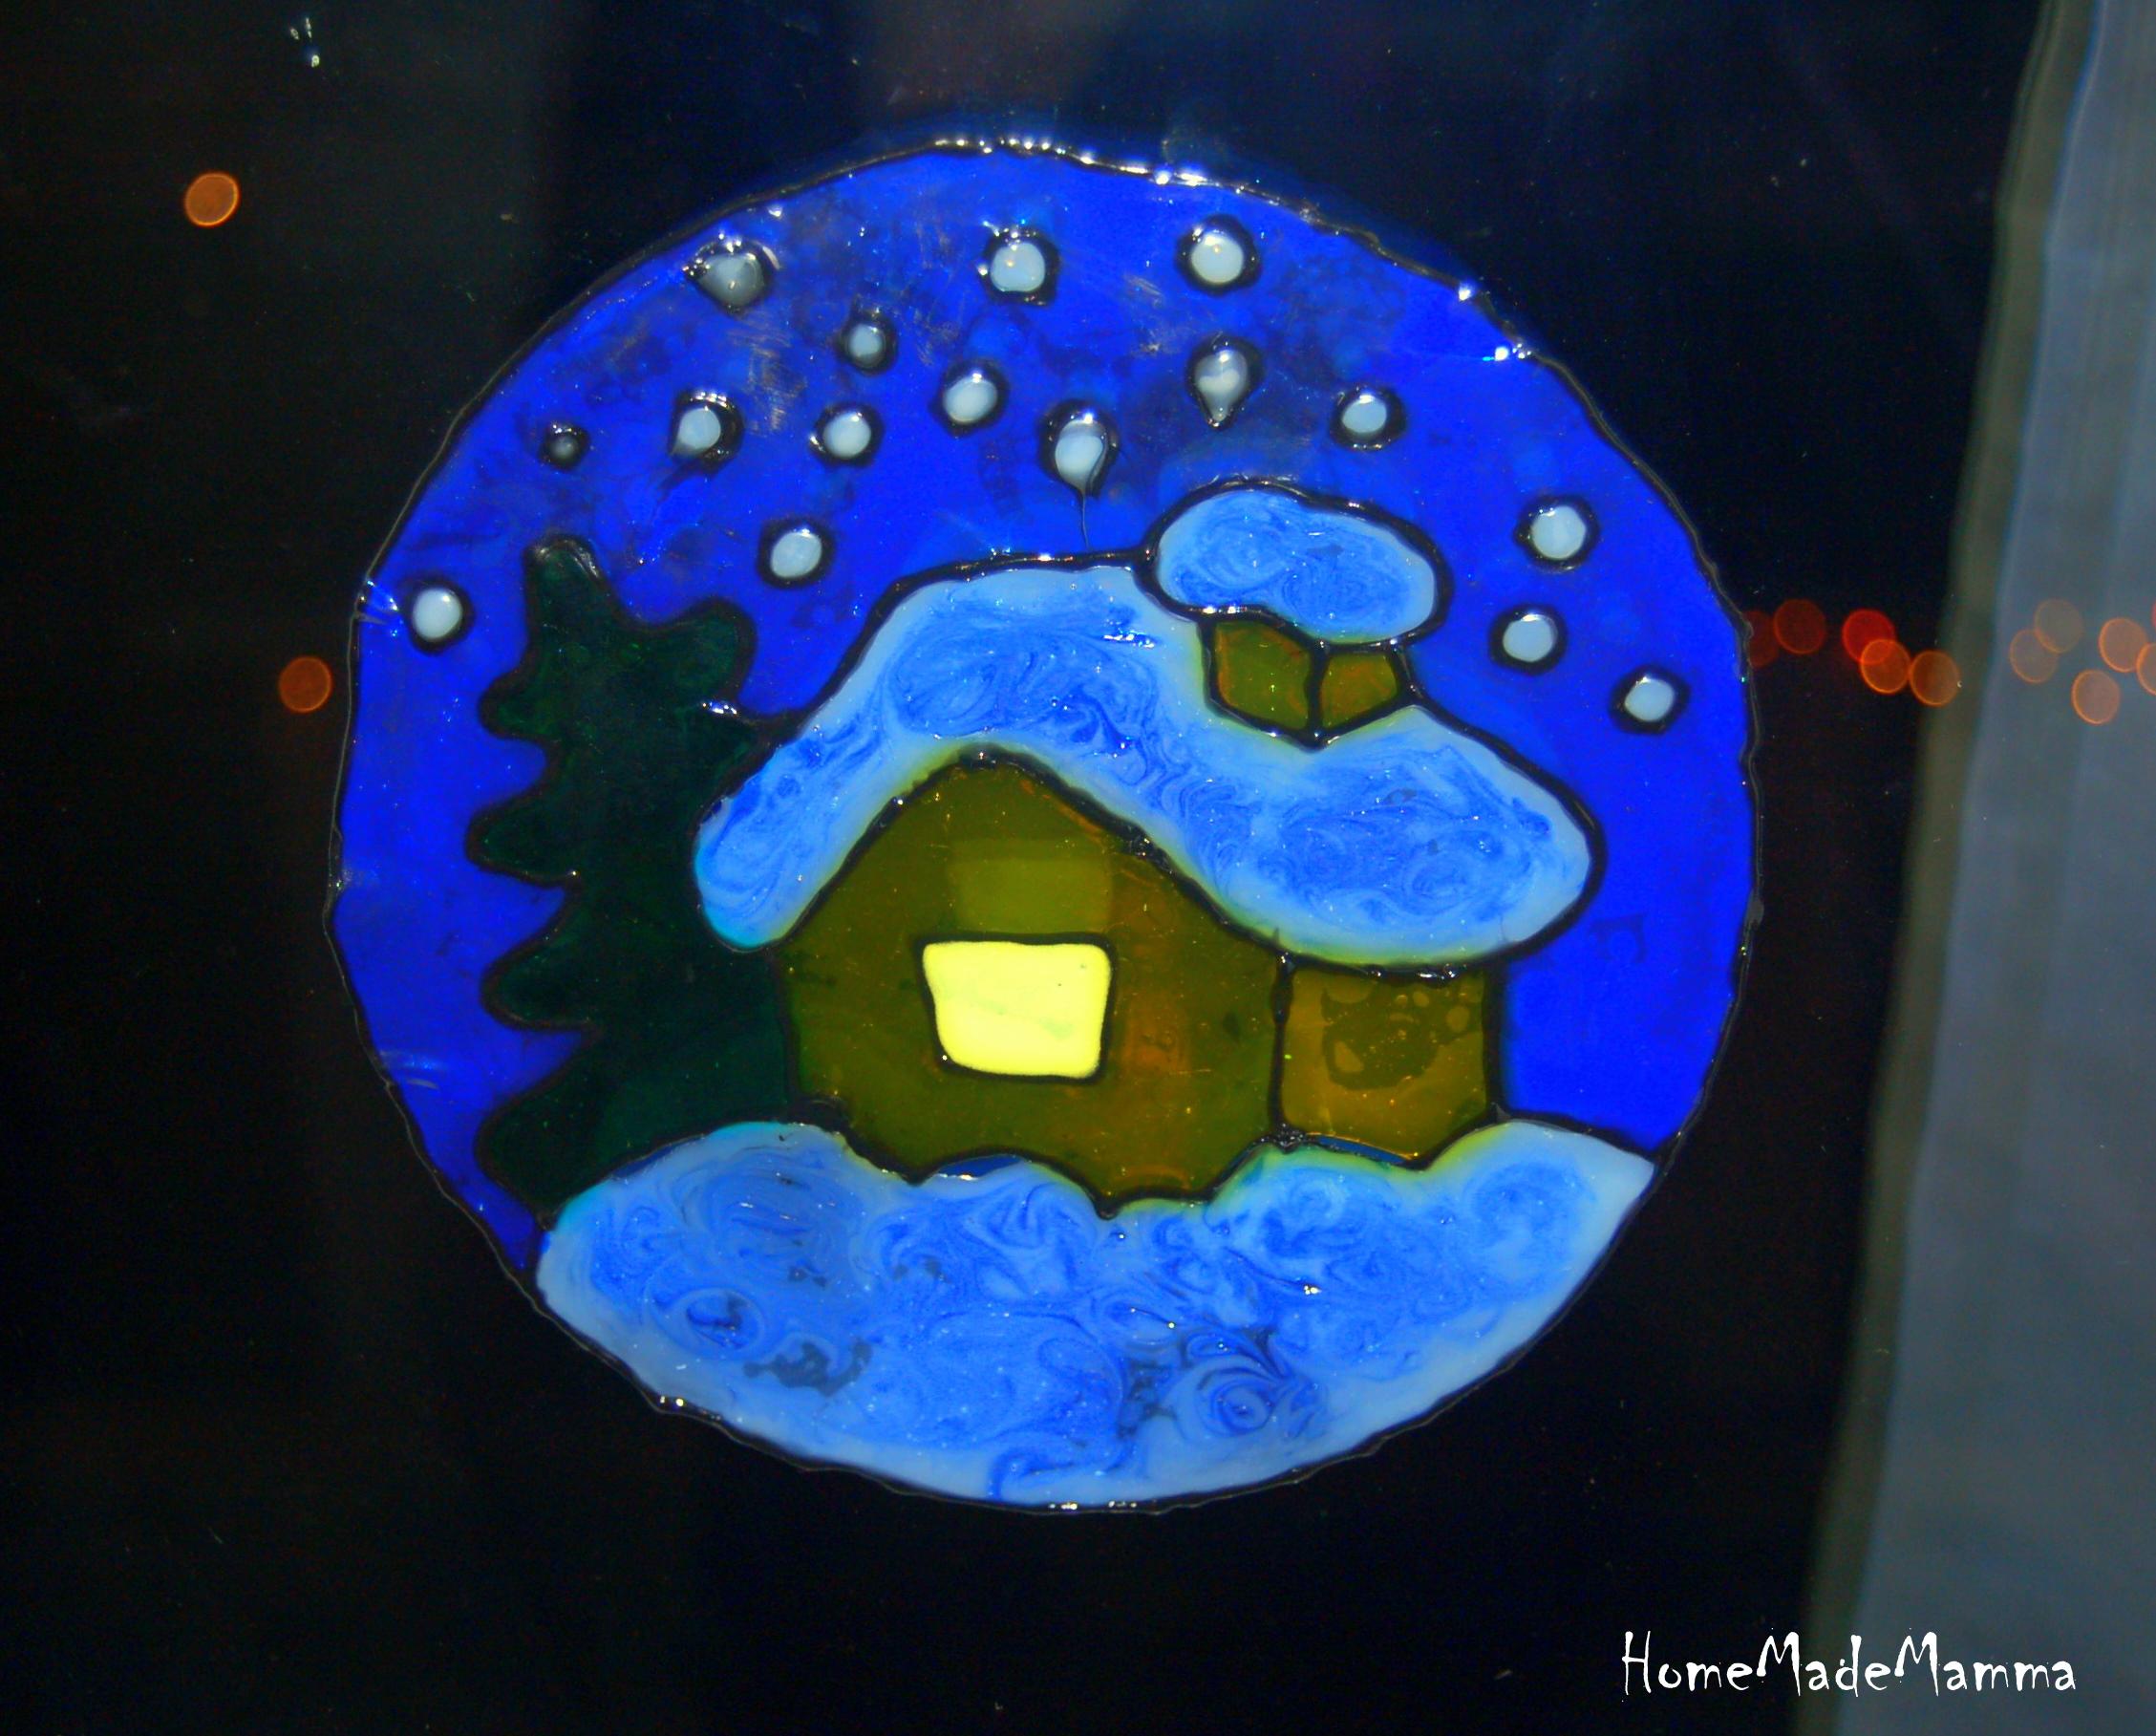 Decorare Finestre Per Natale Scuola alberelli, candele, renne: vetrofanie natalizie fai da te